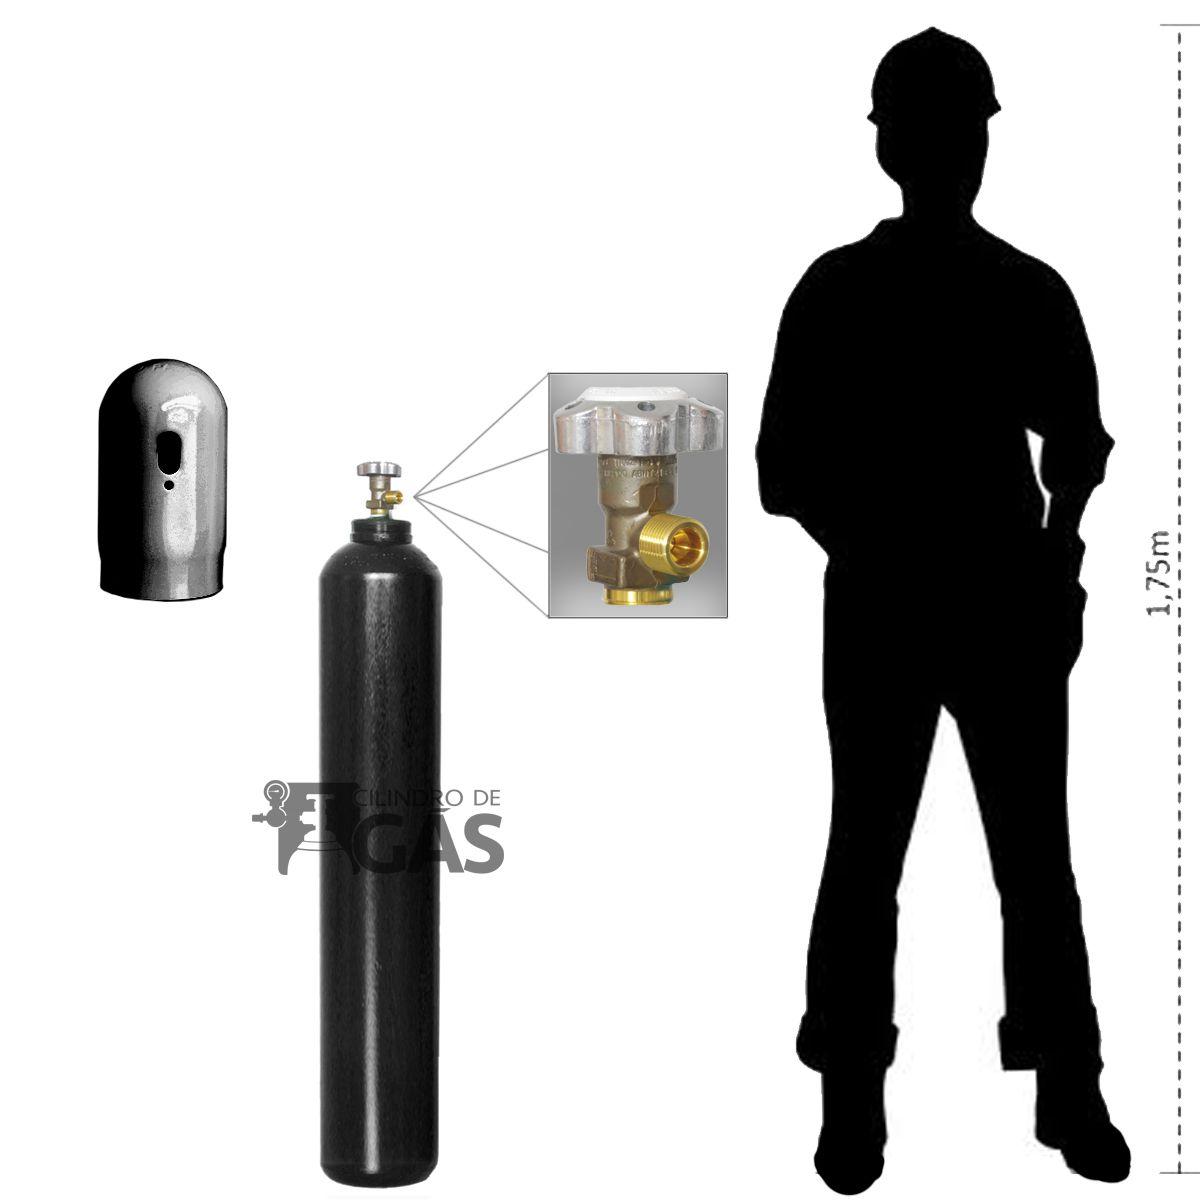 Cilindro para Oxigênio Industrial - 15L